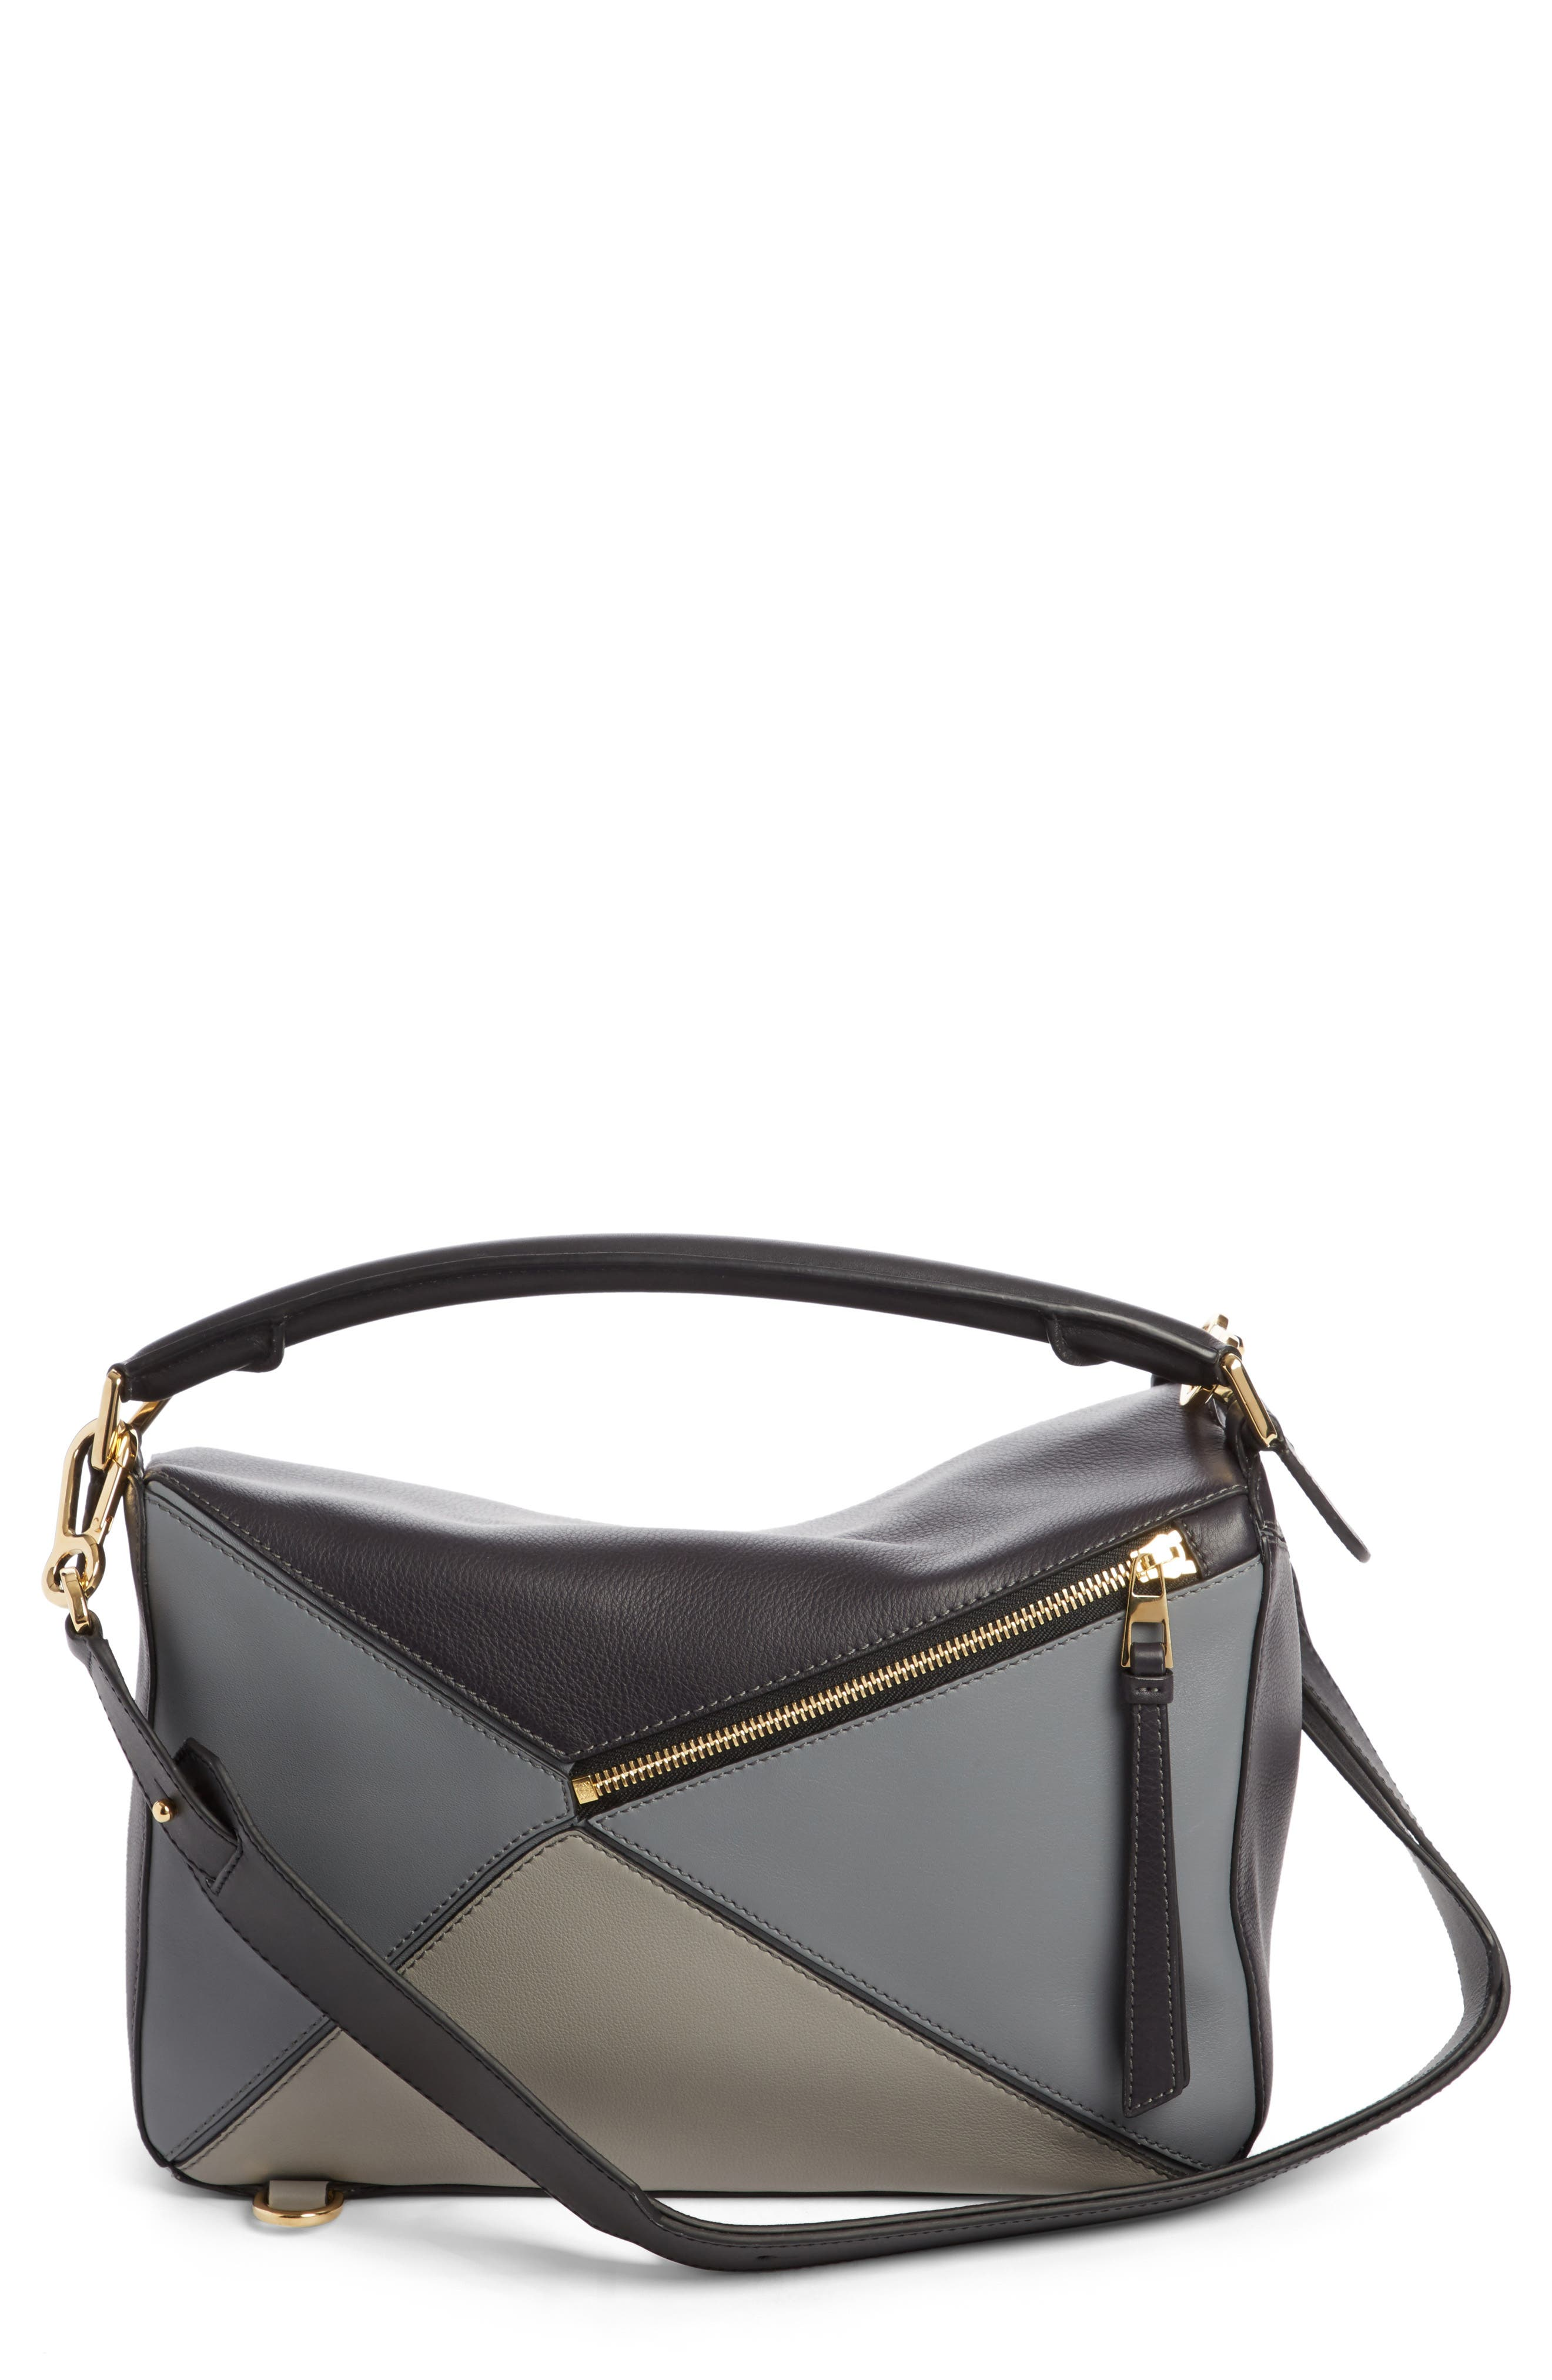 Medium Puzzle Colorblock Leather Shoulder Bag,                             Alternate thumbnail 2, color,                             Grey Multi Tone